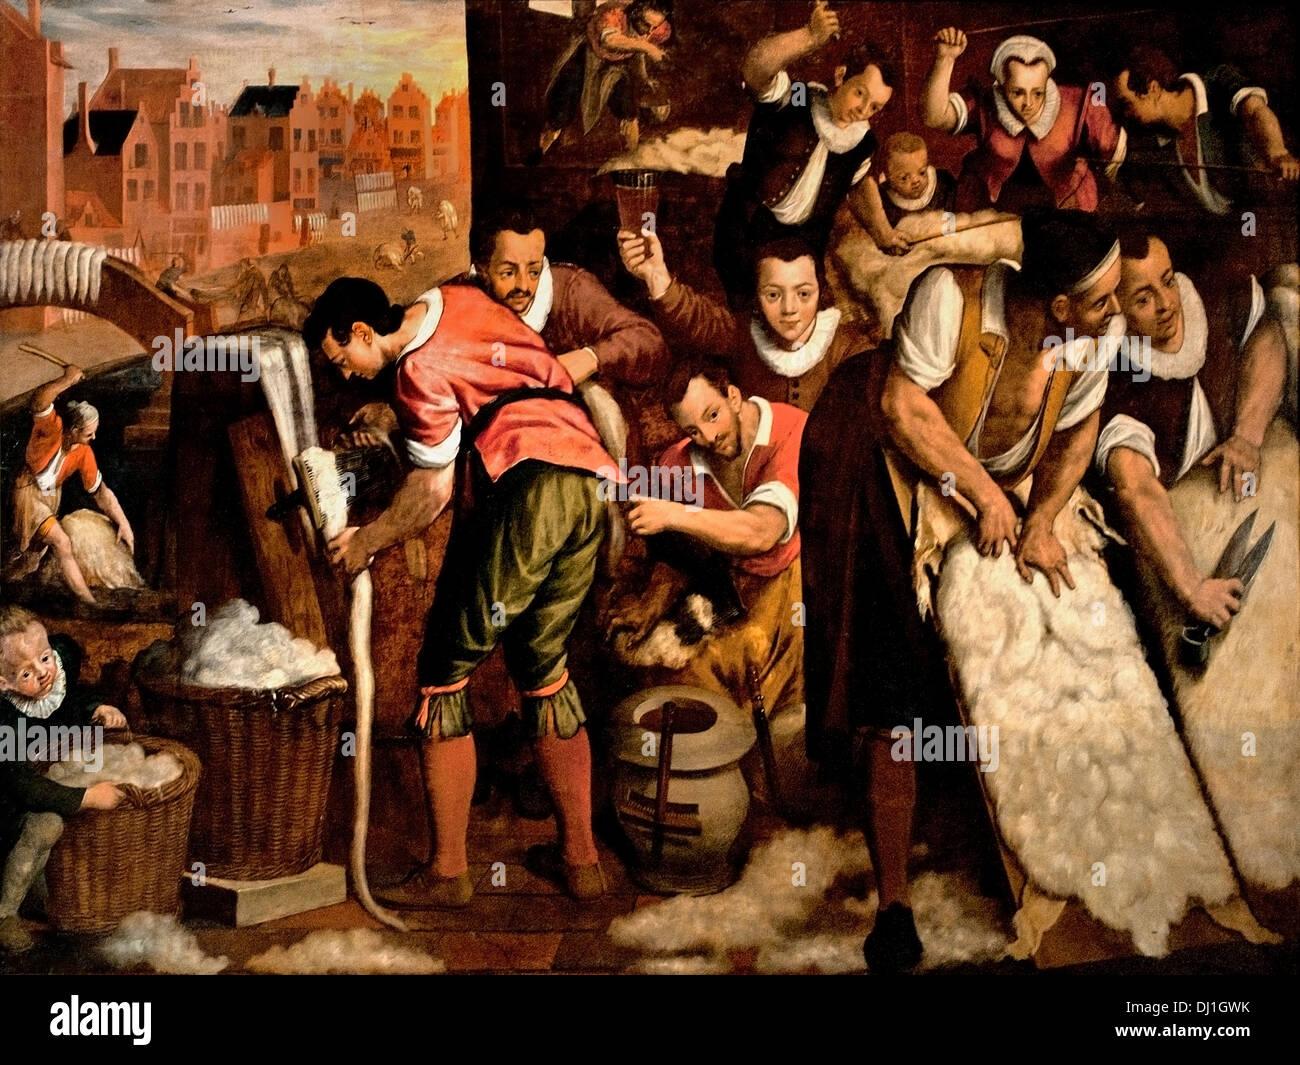 The ploating and combing 1594 Wool Industry Leiden Isaac Claesz van Swanenburg Dutch Netherlands - Stock Image